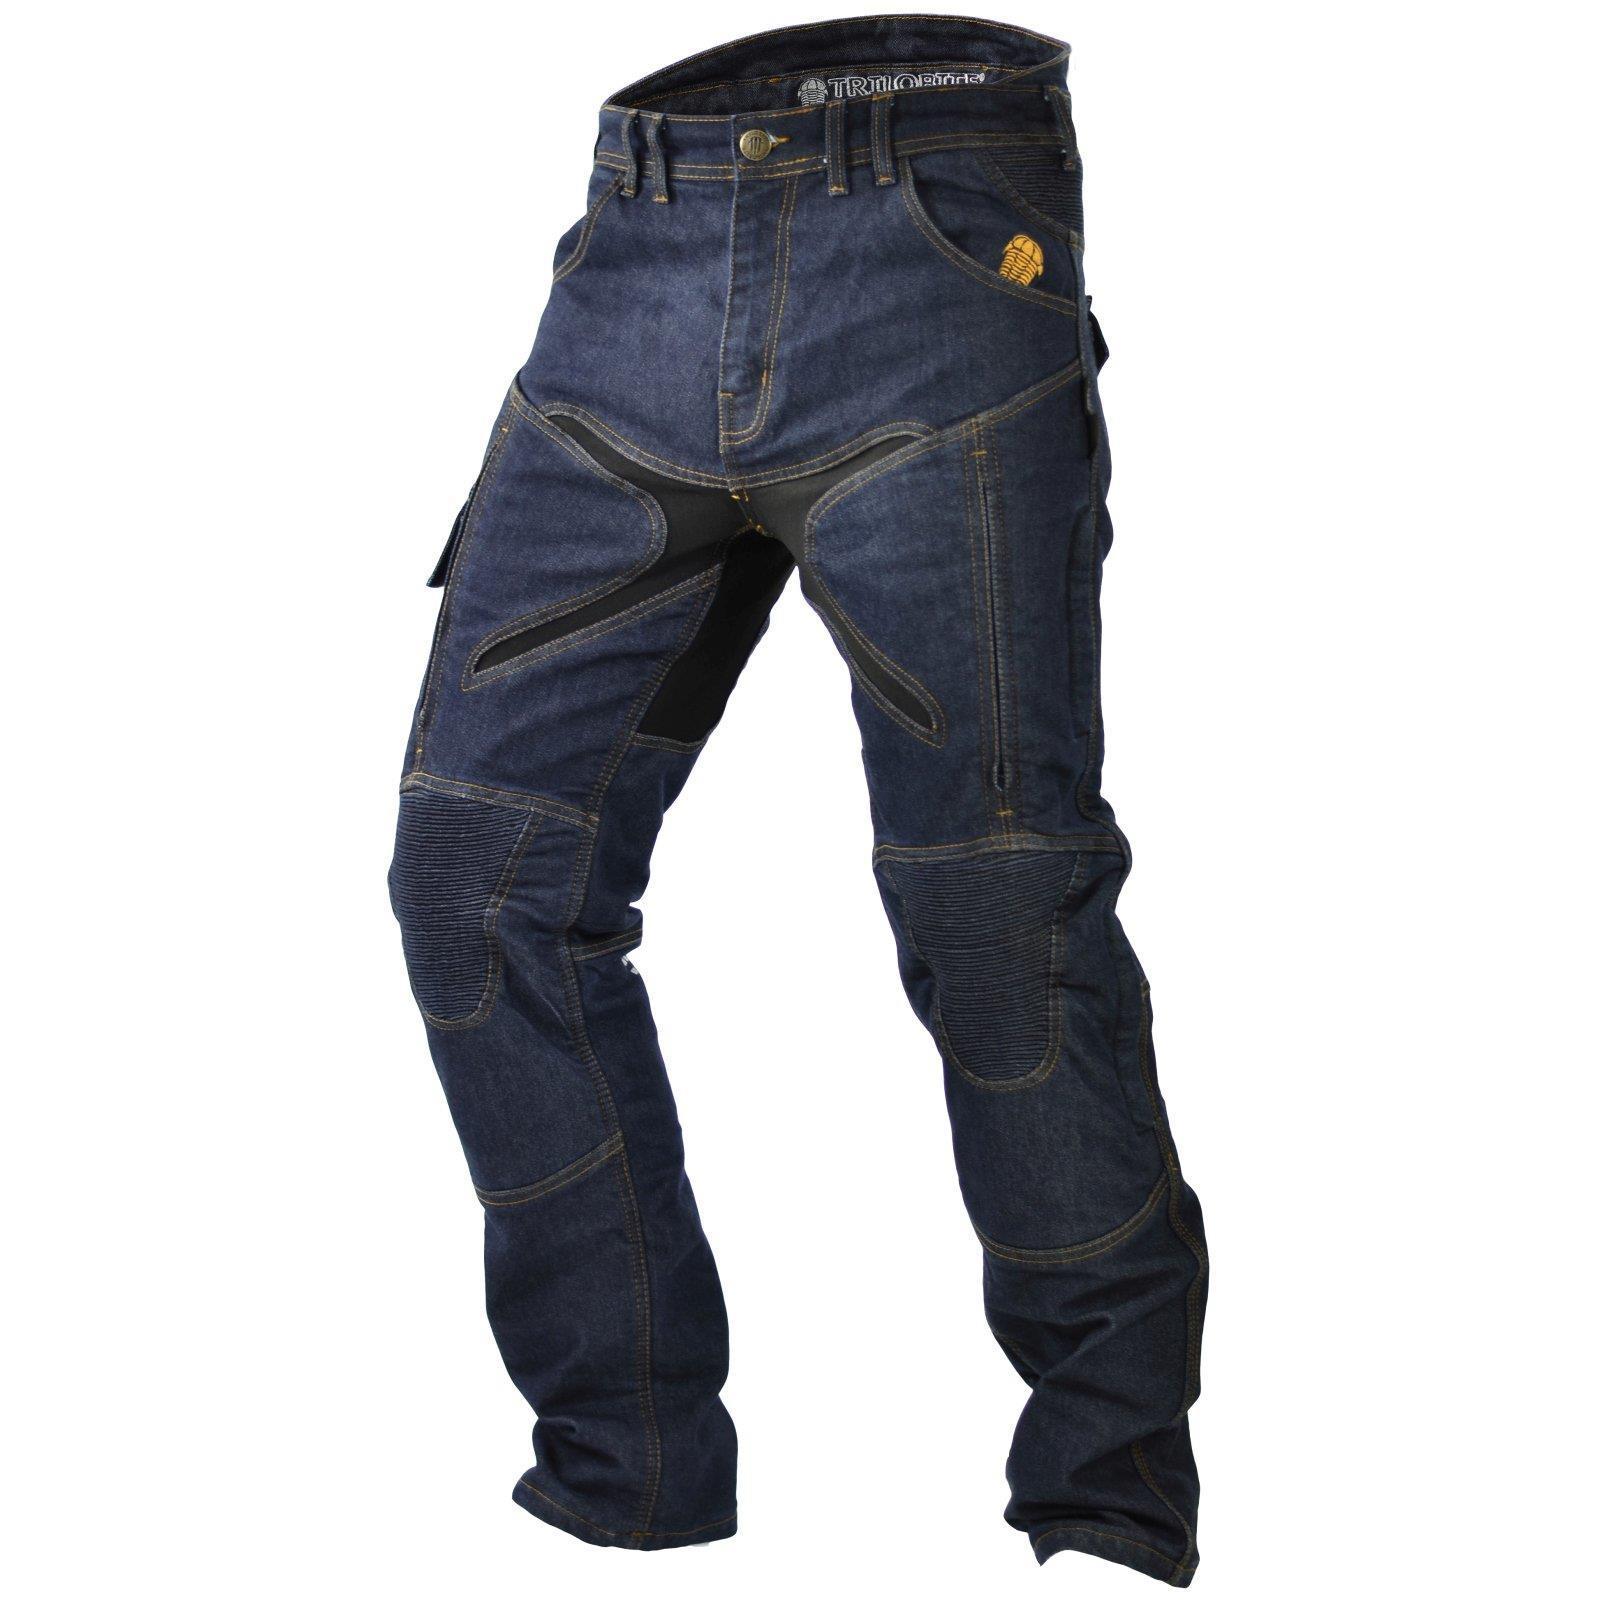 Trilobite-Pantaloni-Moto-Jeans-Abbigliamento-Parado-MICAS-URBAN-DUAL-PANTS-ACID miniatura 25